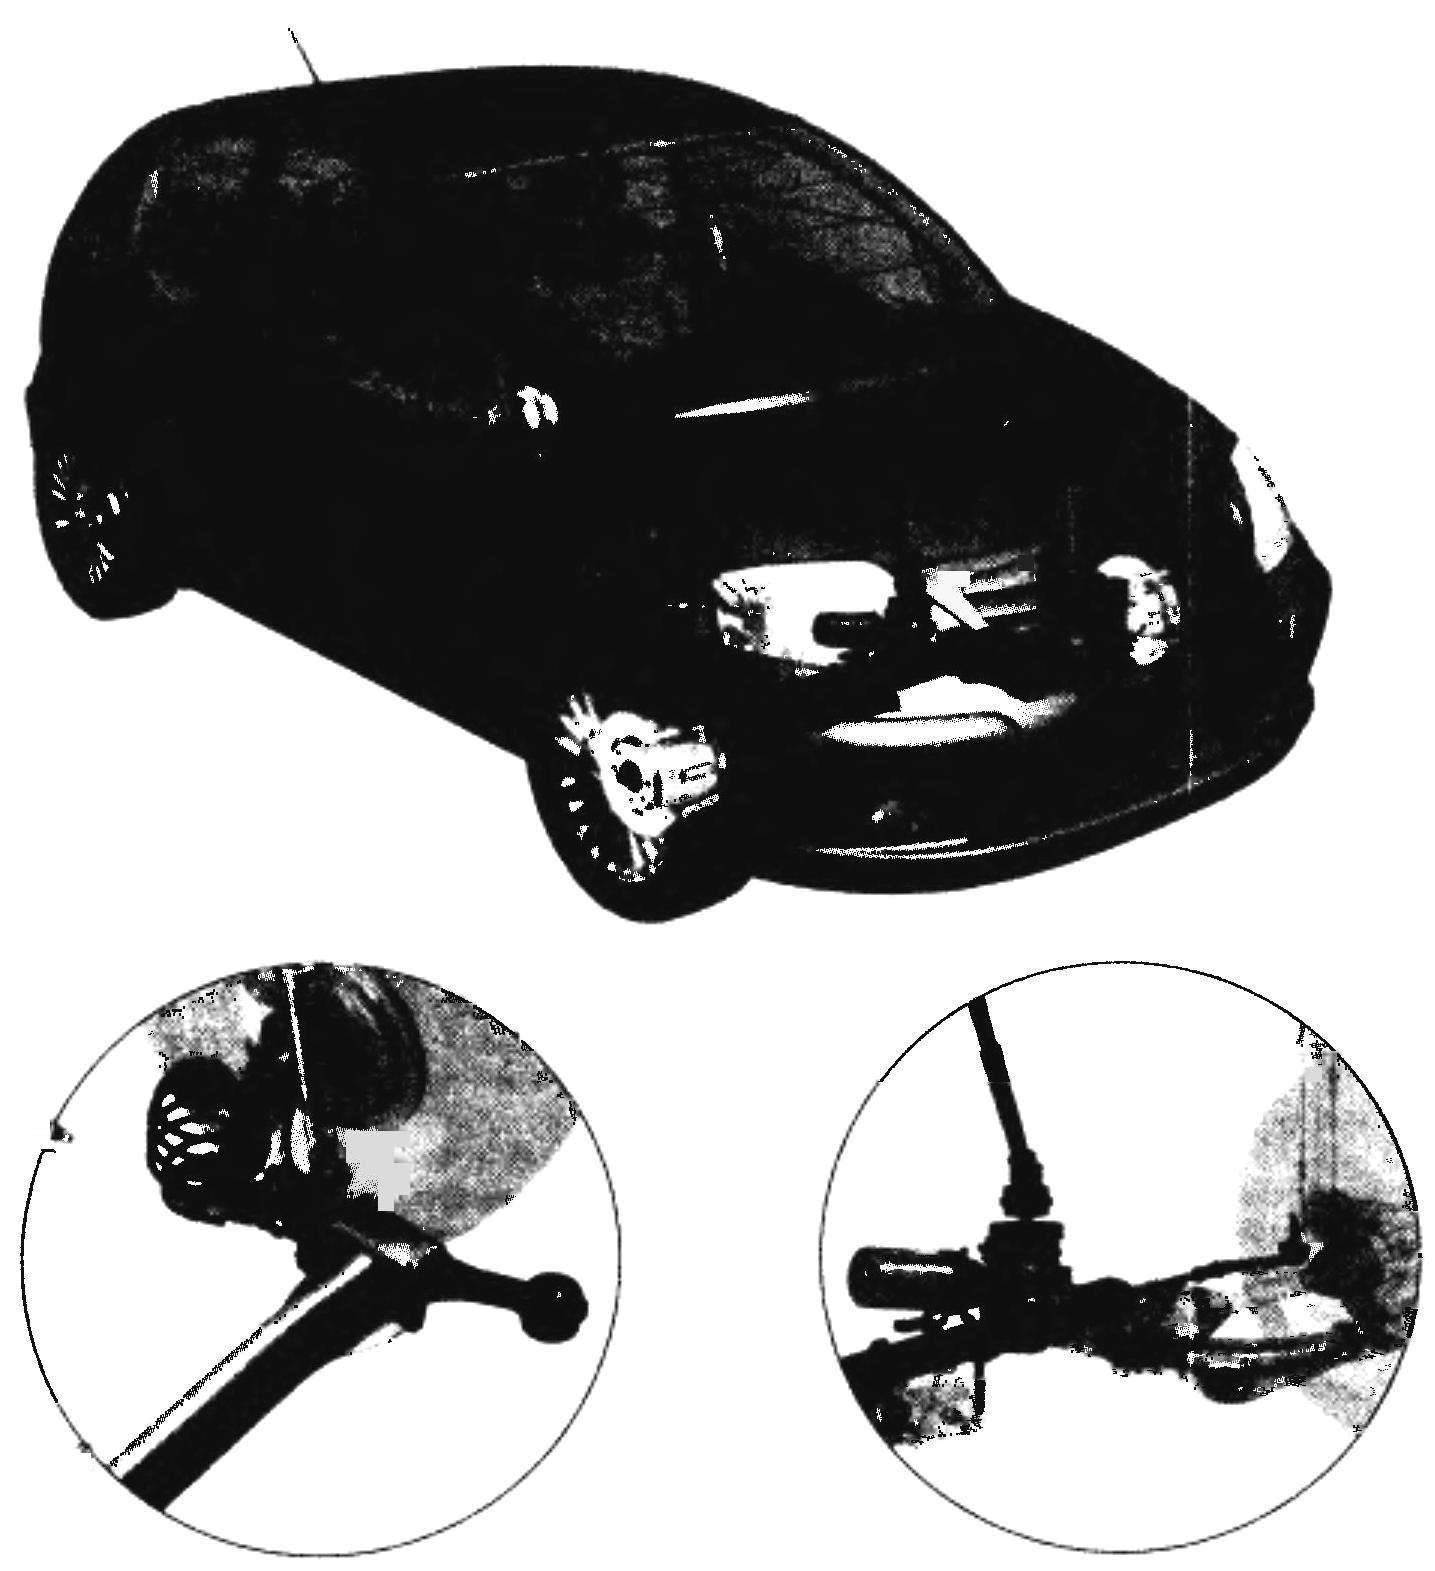 CITROEN C3 suspension. Lower right independent spring suspension type McPherson; left — semi-spring rear suspension